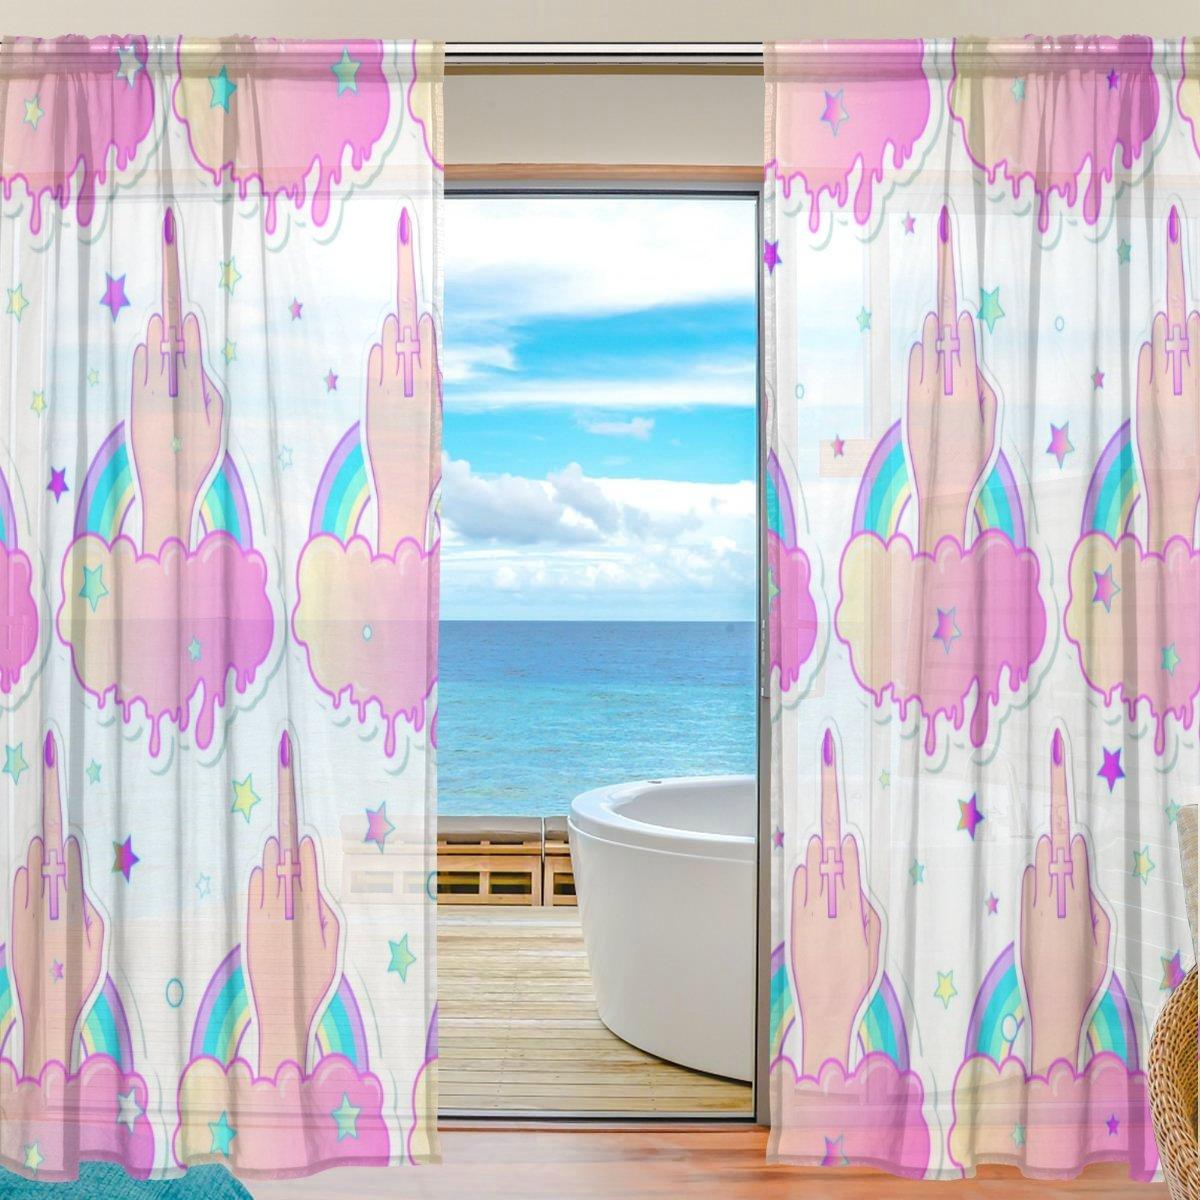 Amazon.com: DEYYA Home Middle Finger Sheer Window Curtains Panel ...